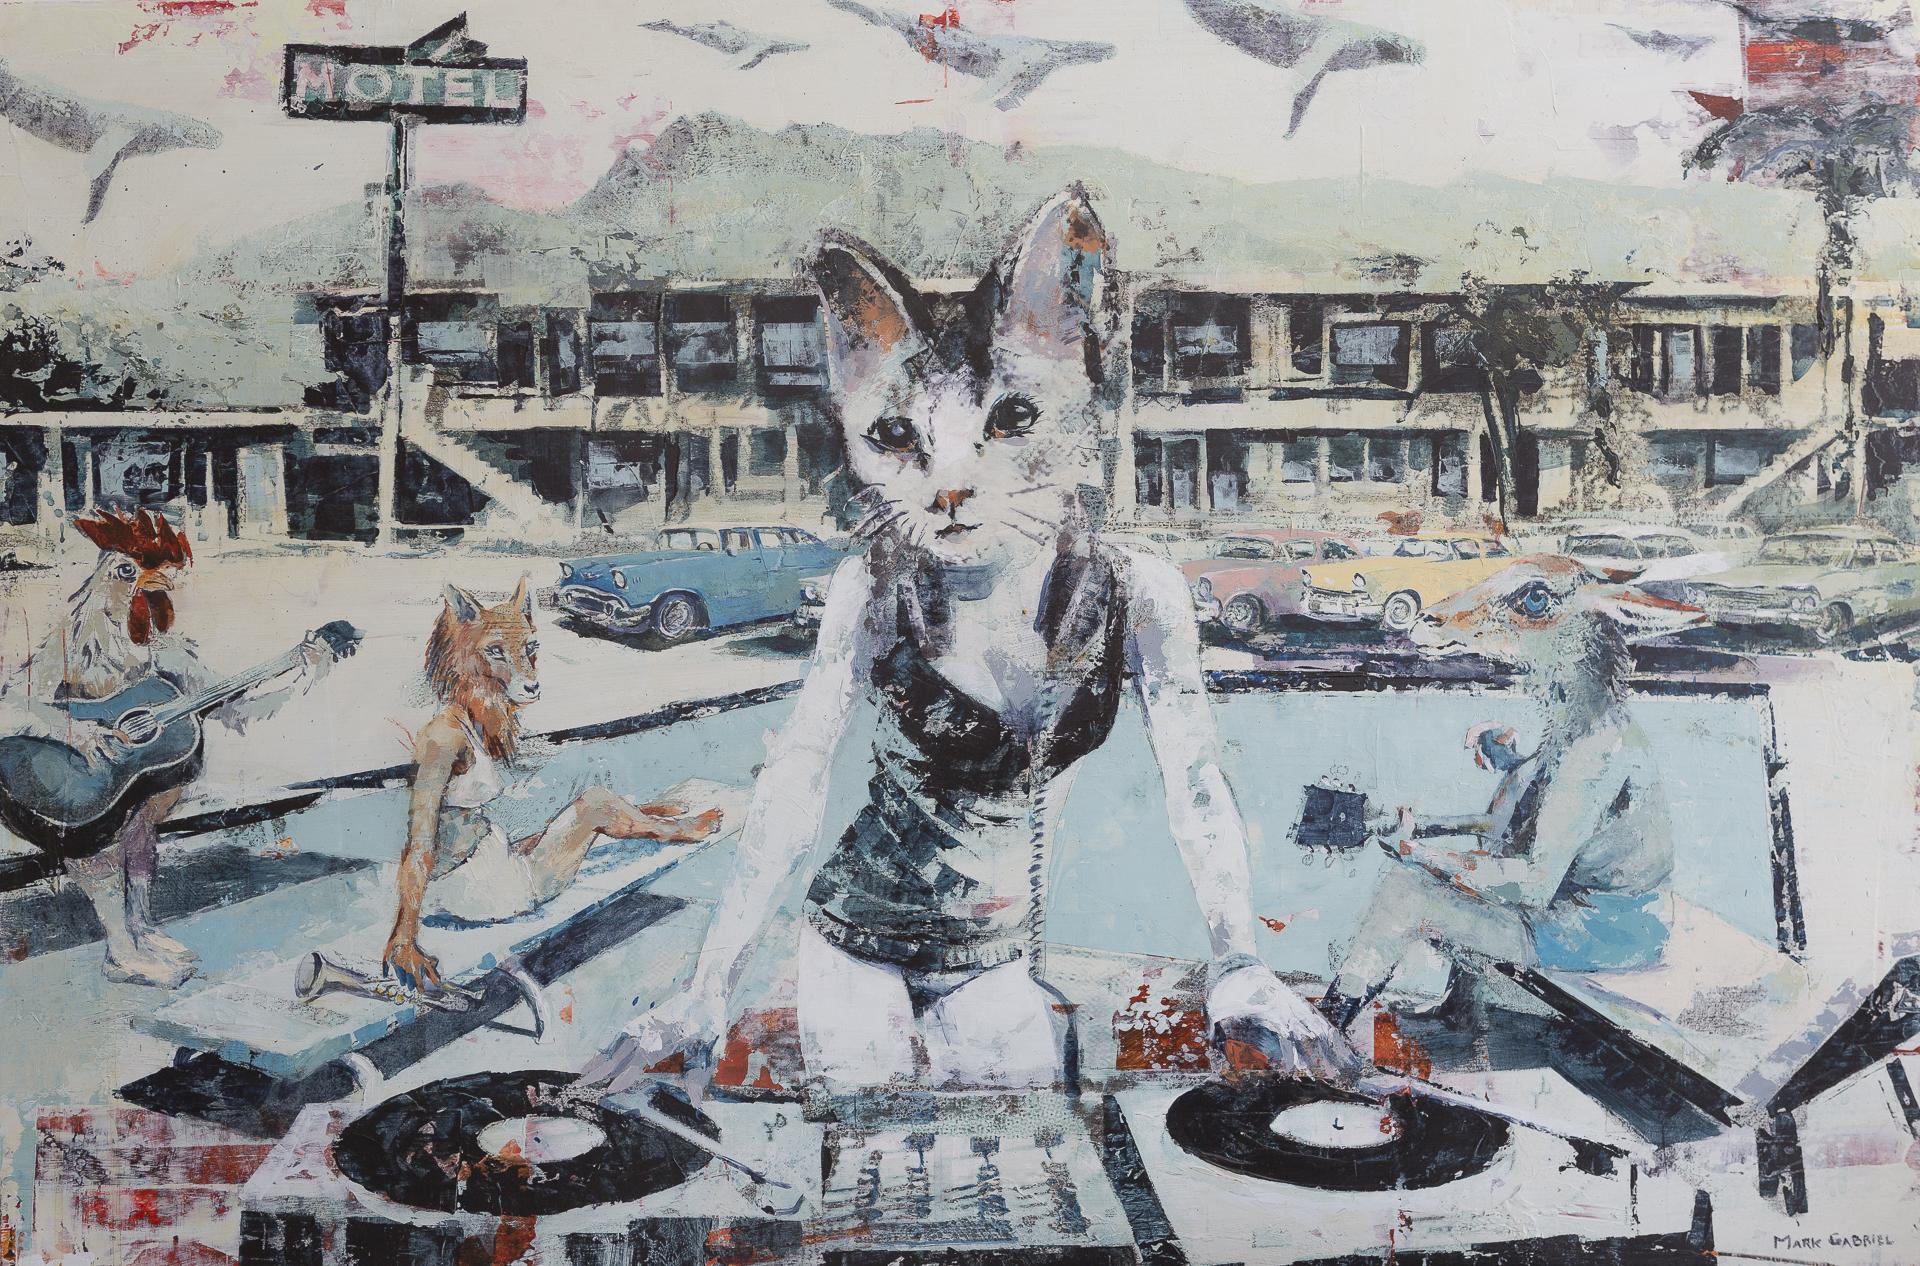 """Gary's Kitty"" 36 x 24 inch"